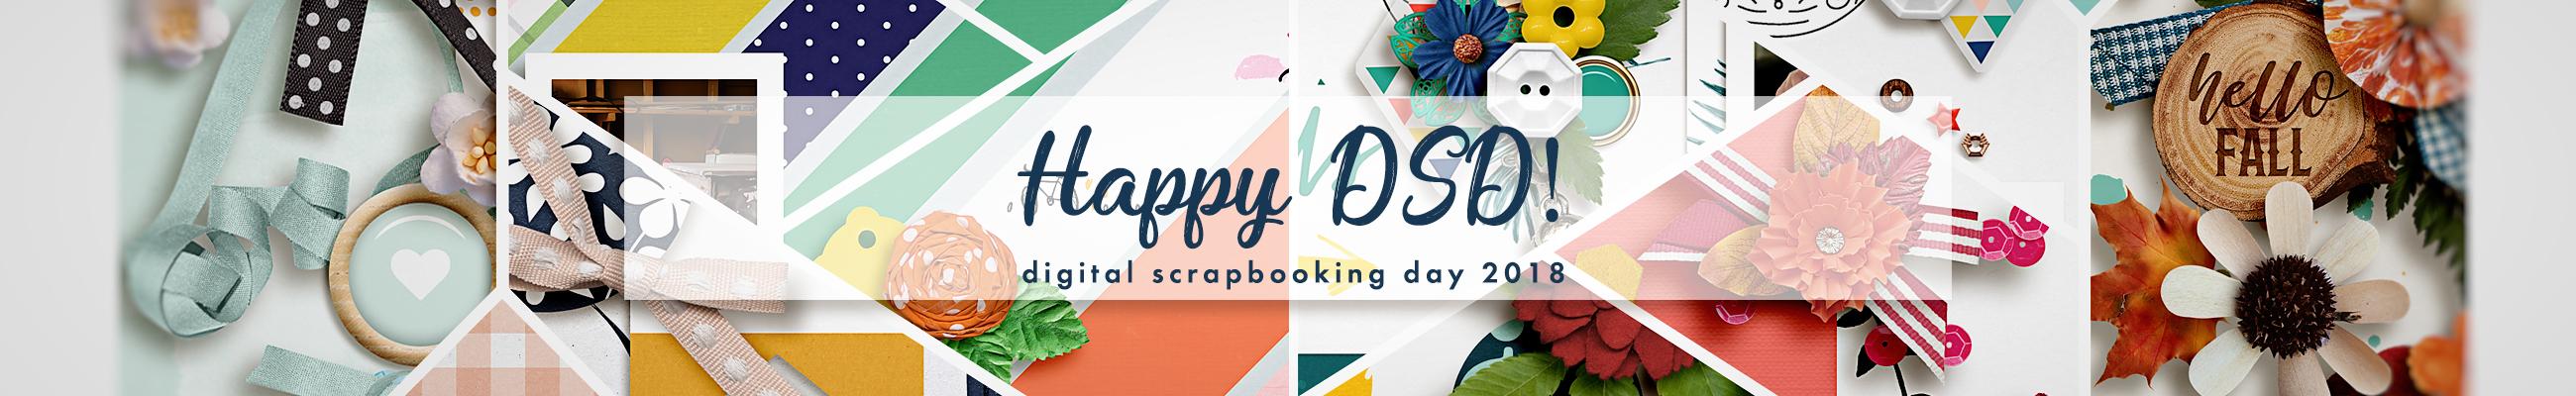 Digital Scrapbooking Day 2018